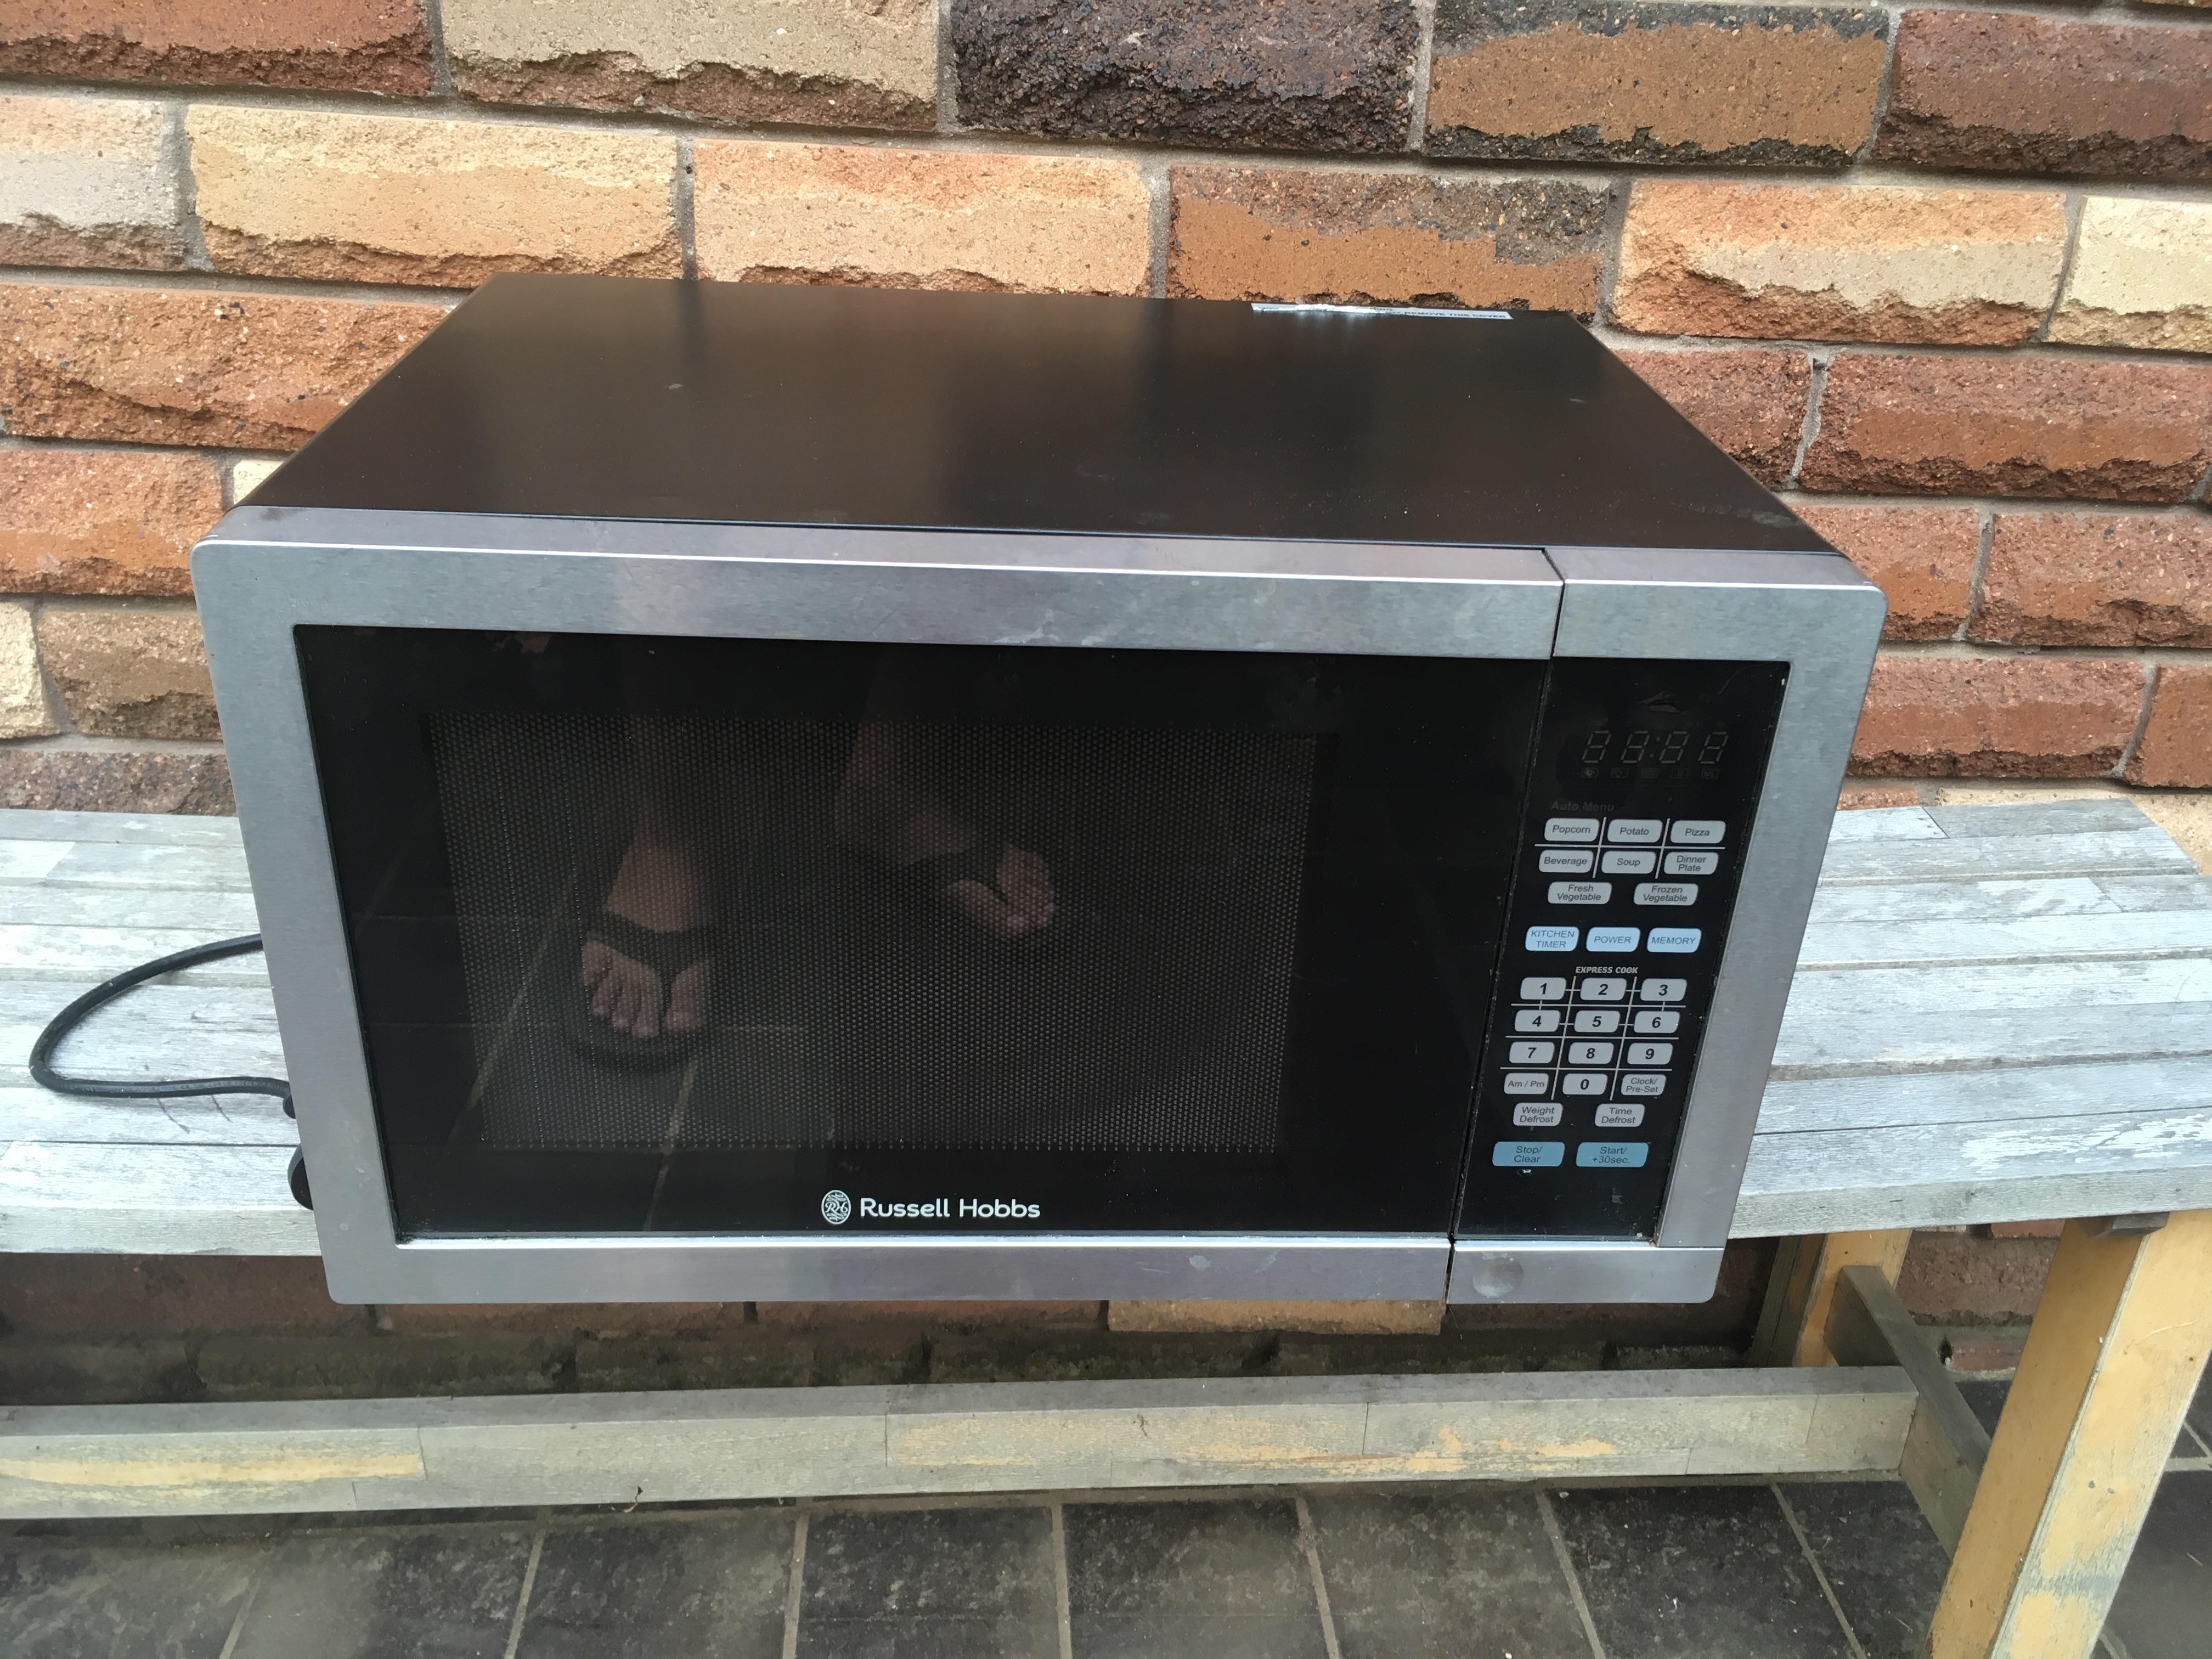 Russell Hobbs Microwave Oven RHMO100